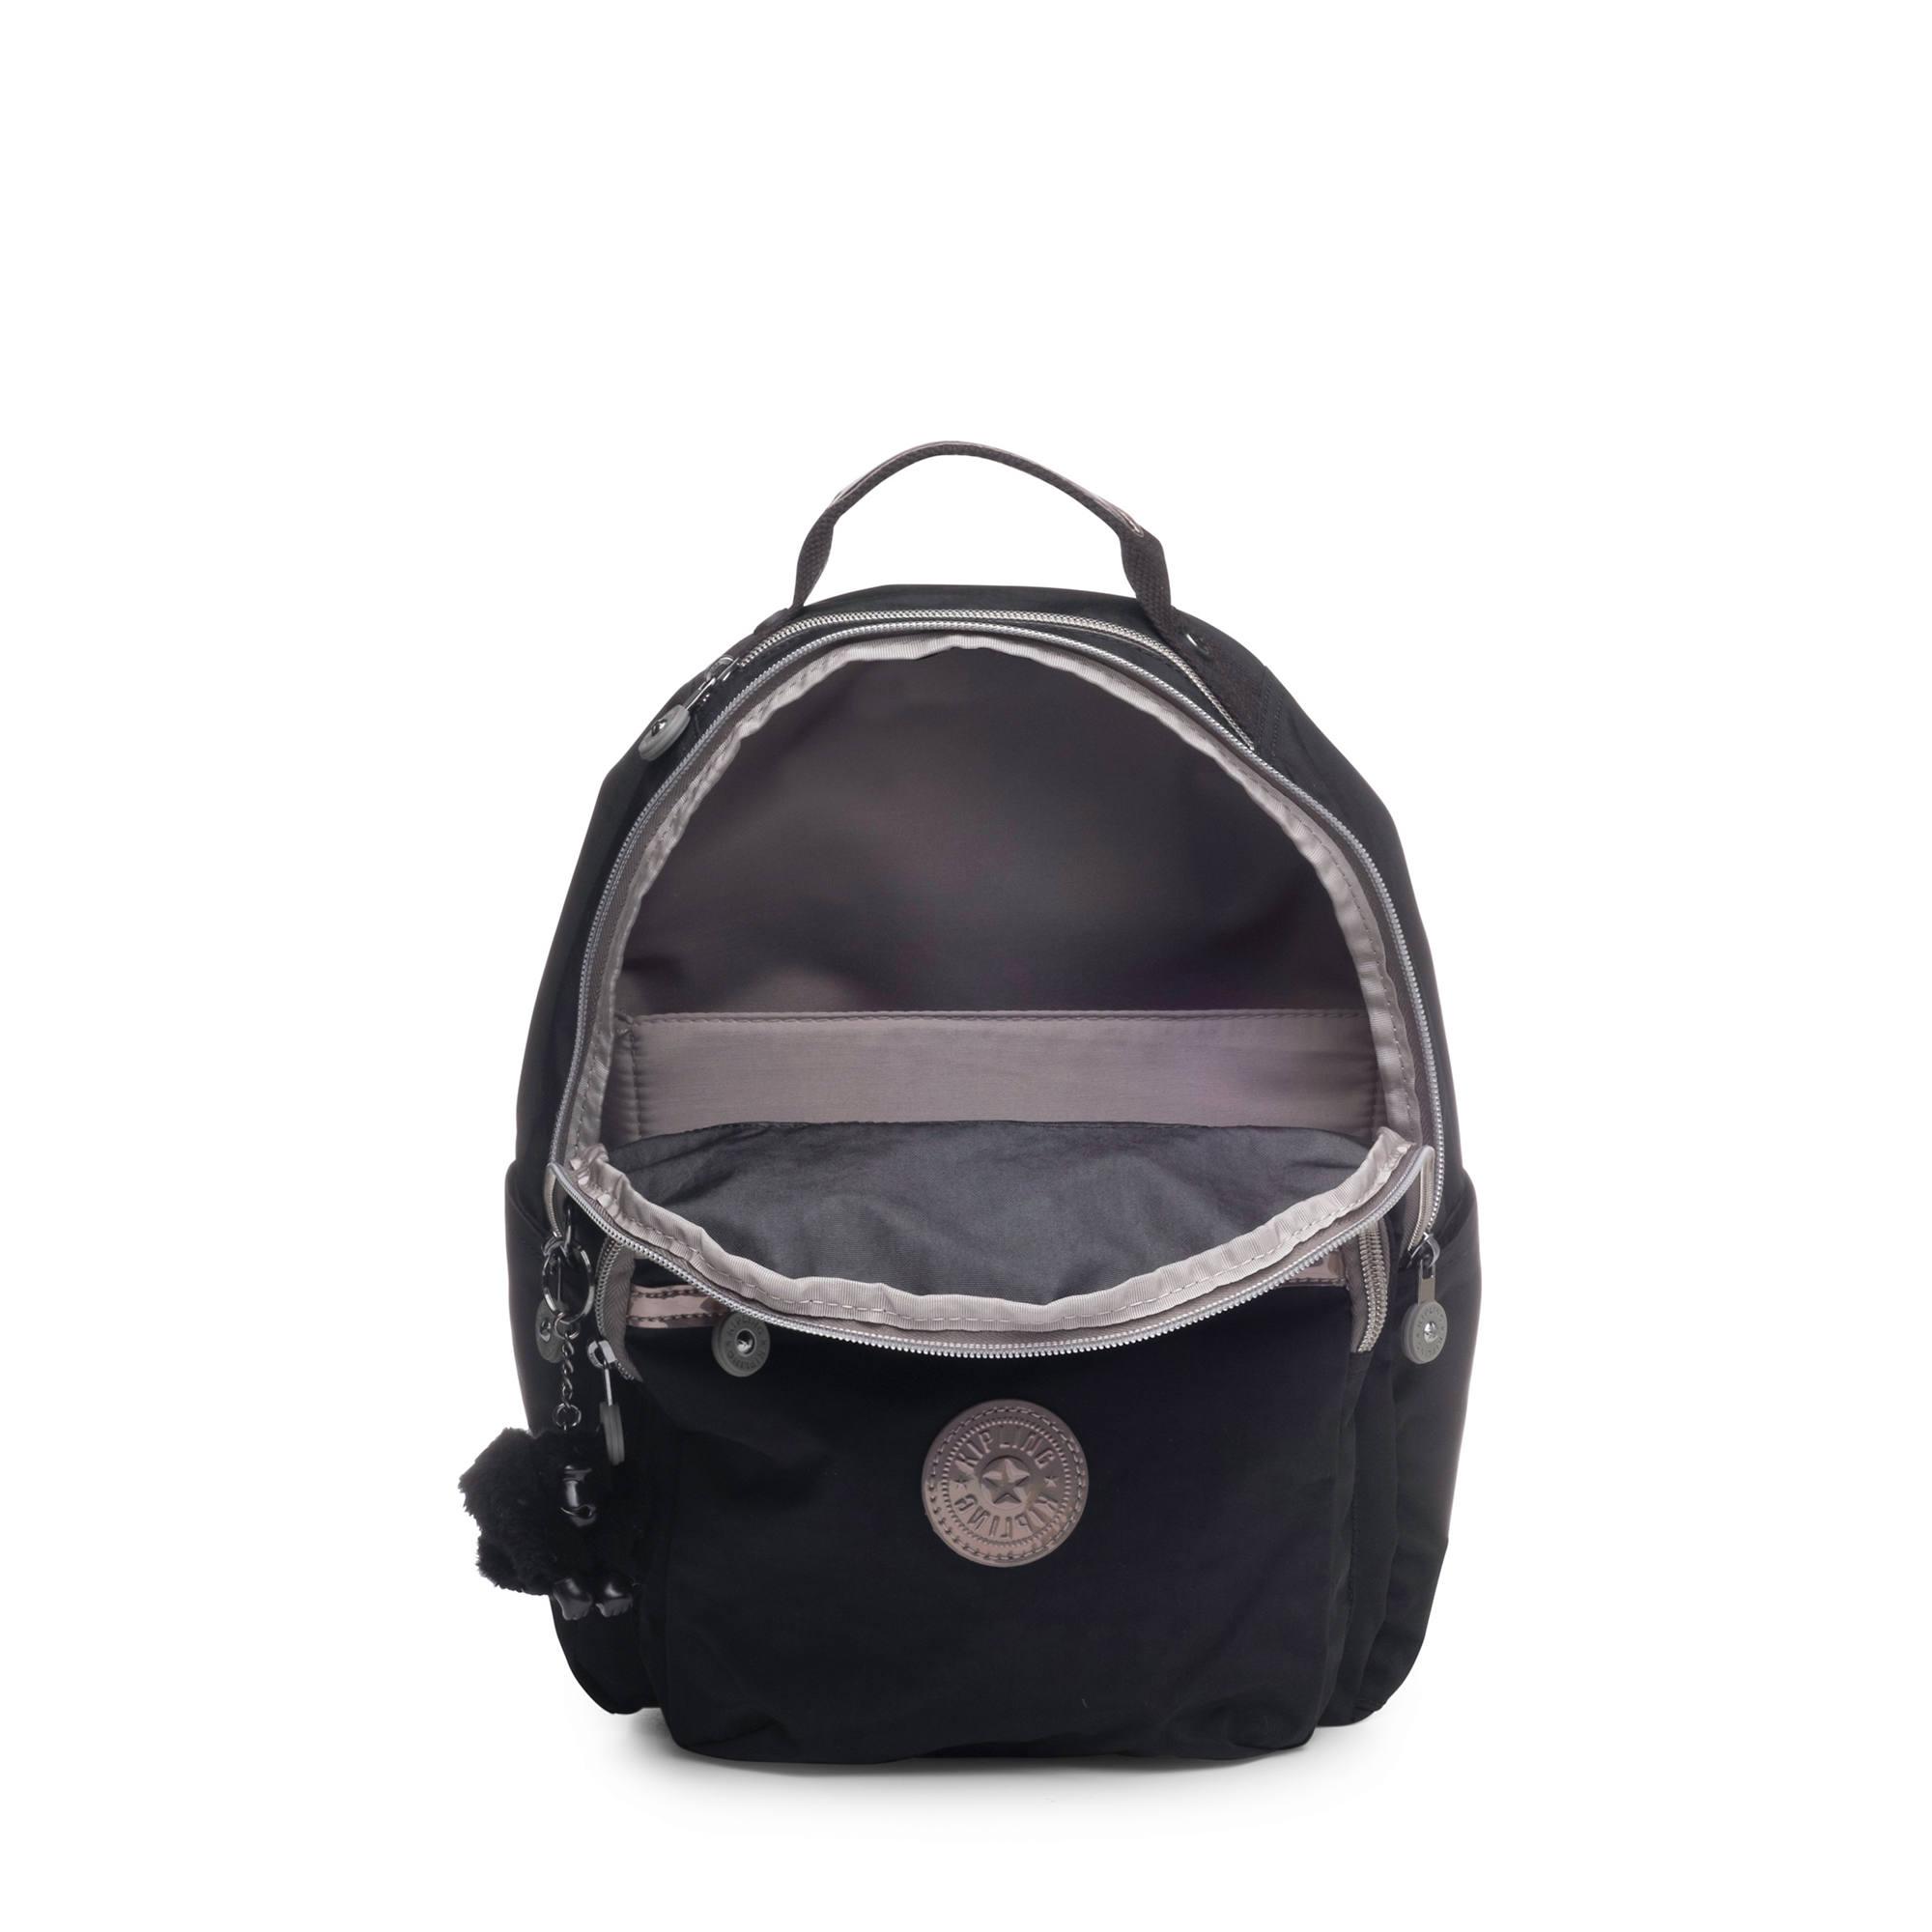 Kipling-Seoul-Small-11-034-Laptop-Backpack thumbnail 12